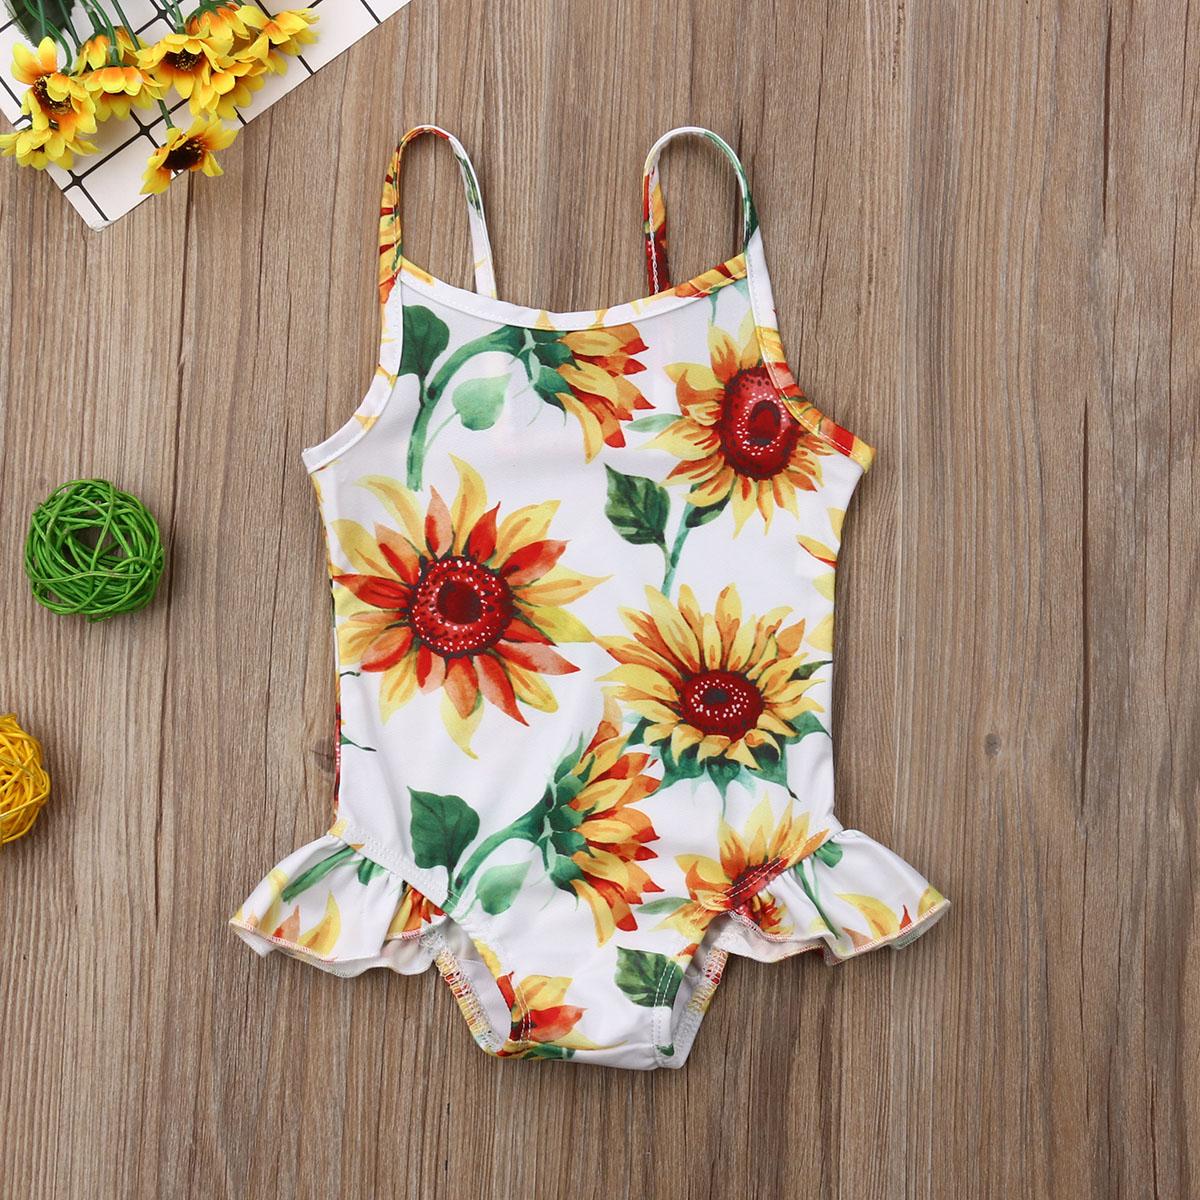 Emmababy Swimwear Infant Baby Girls Flower Swimwear Sleeveless Romper Sling Bathing Girl Kids Baby Beach Clothes